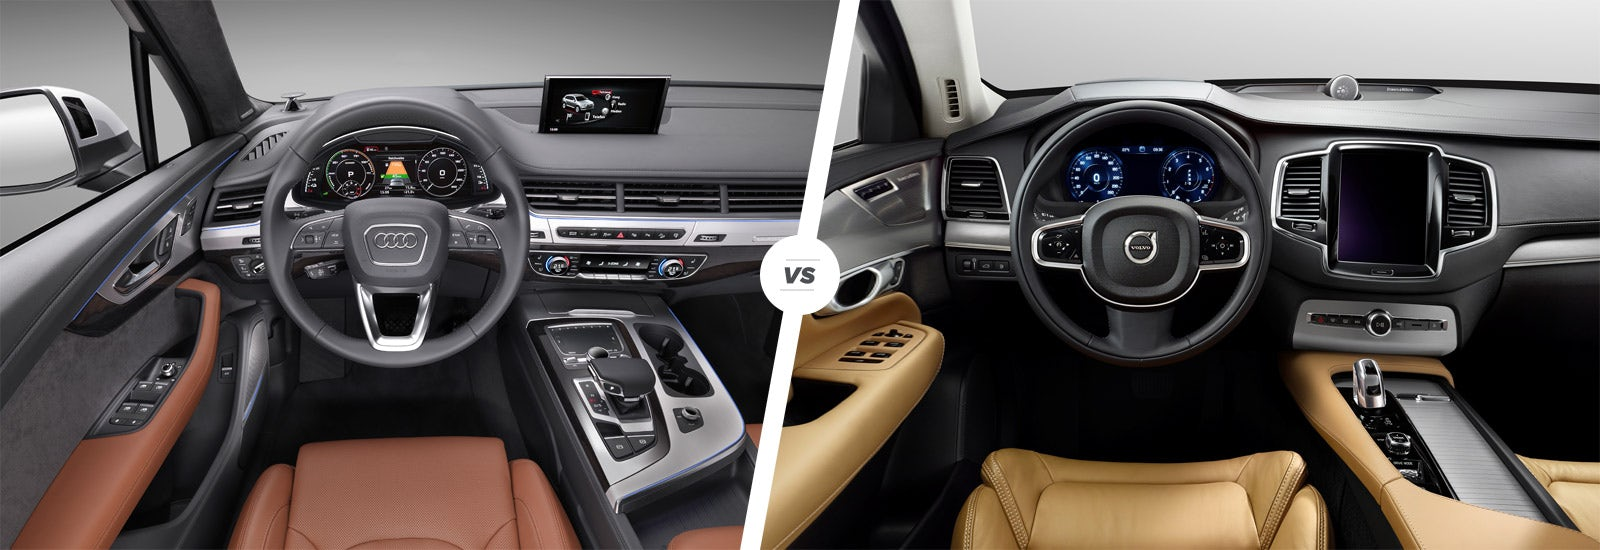 Audi Q7 e-tron vs Volvo XC90 T8 hybrid comparison   carwow